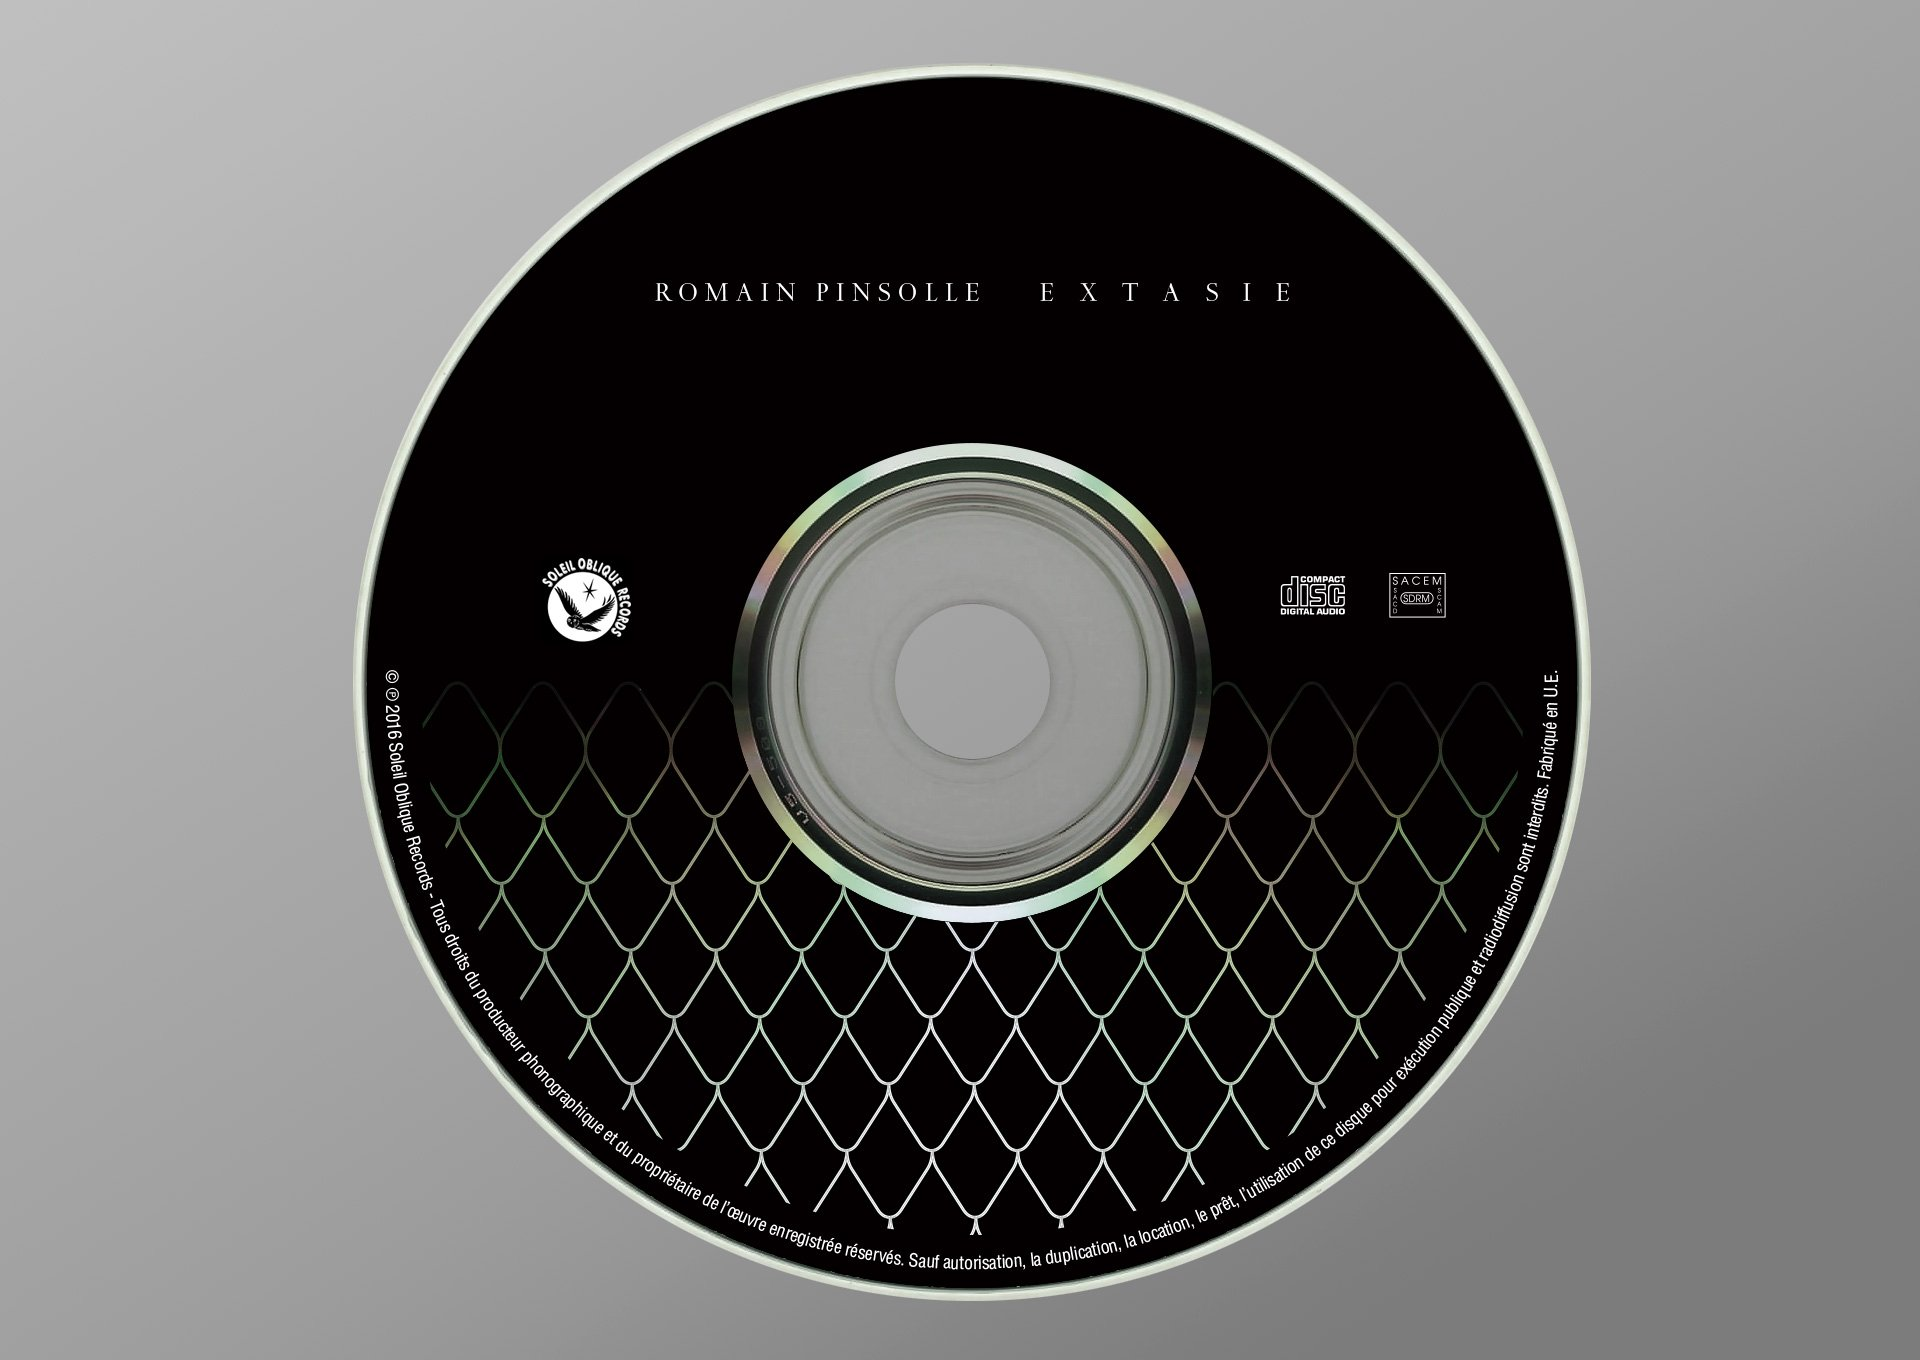 Romain Pinsolle – Extasie Atteret Design